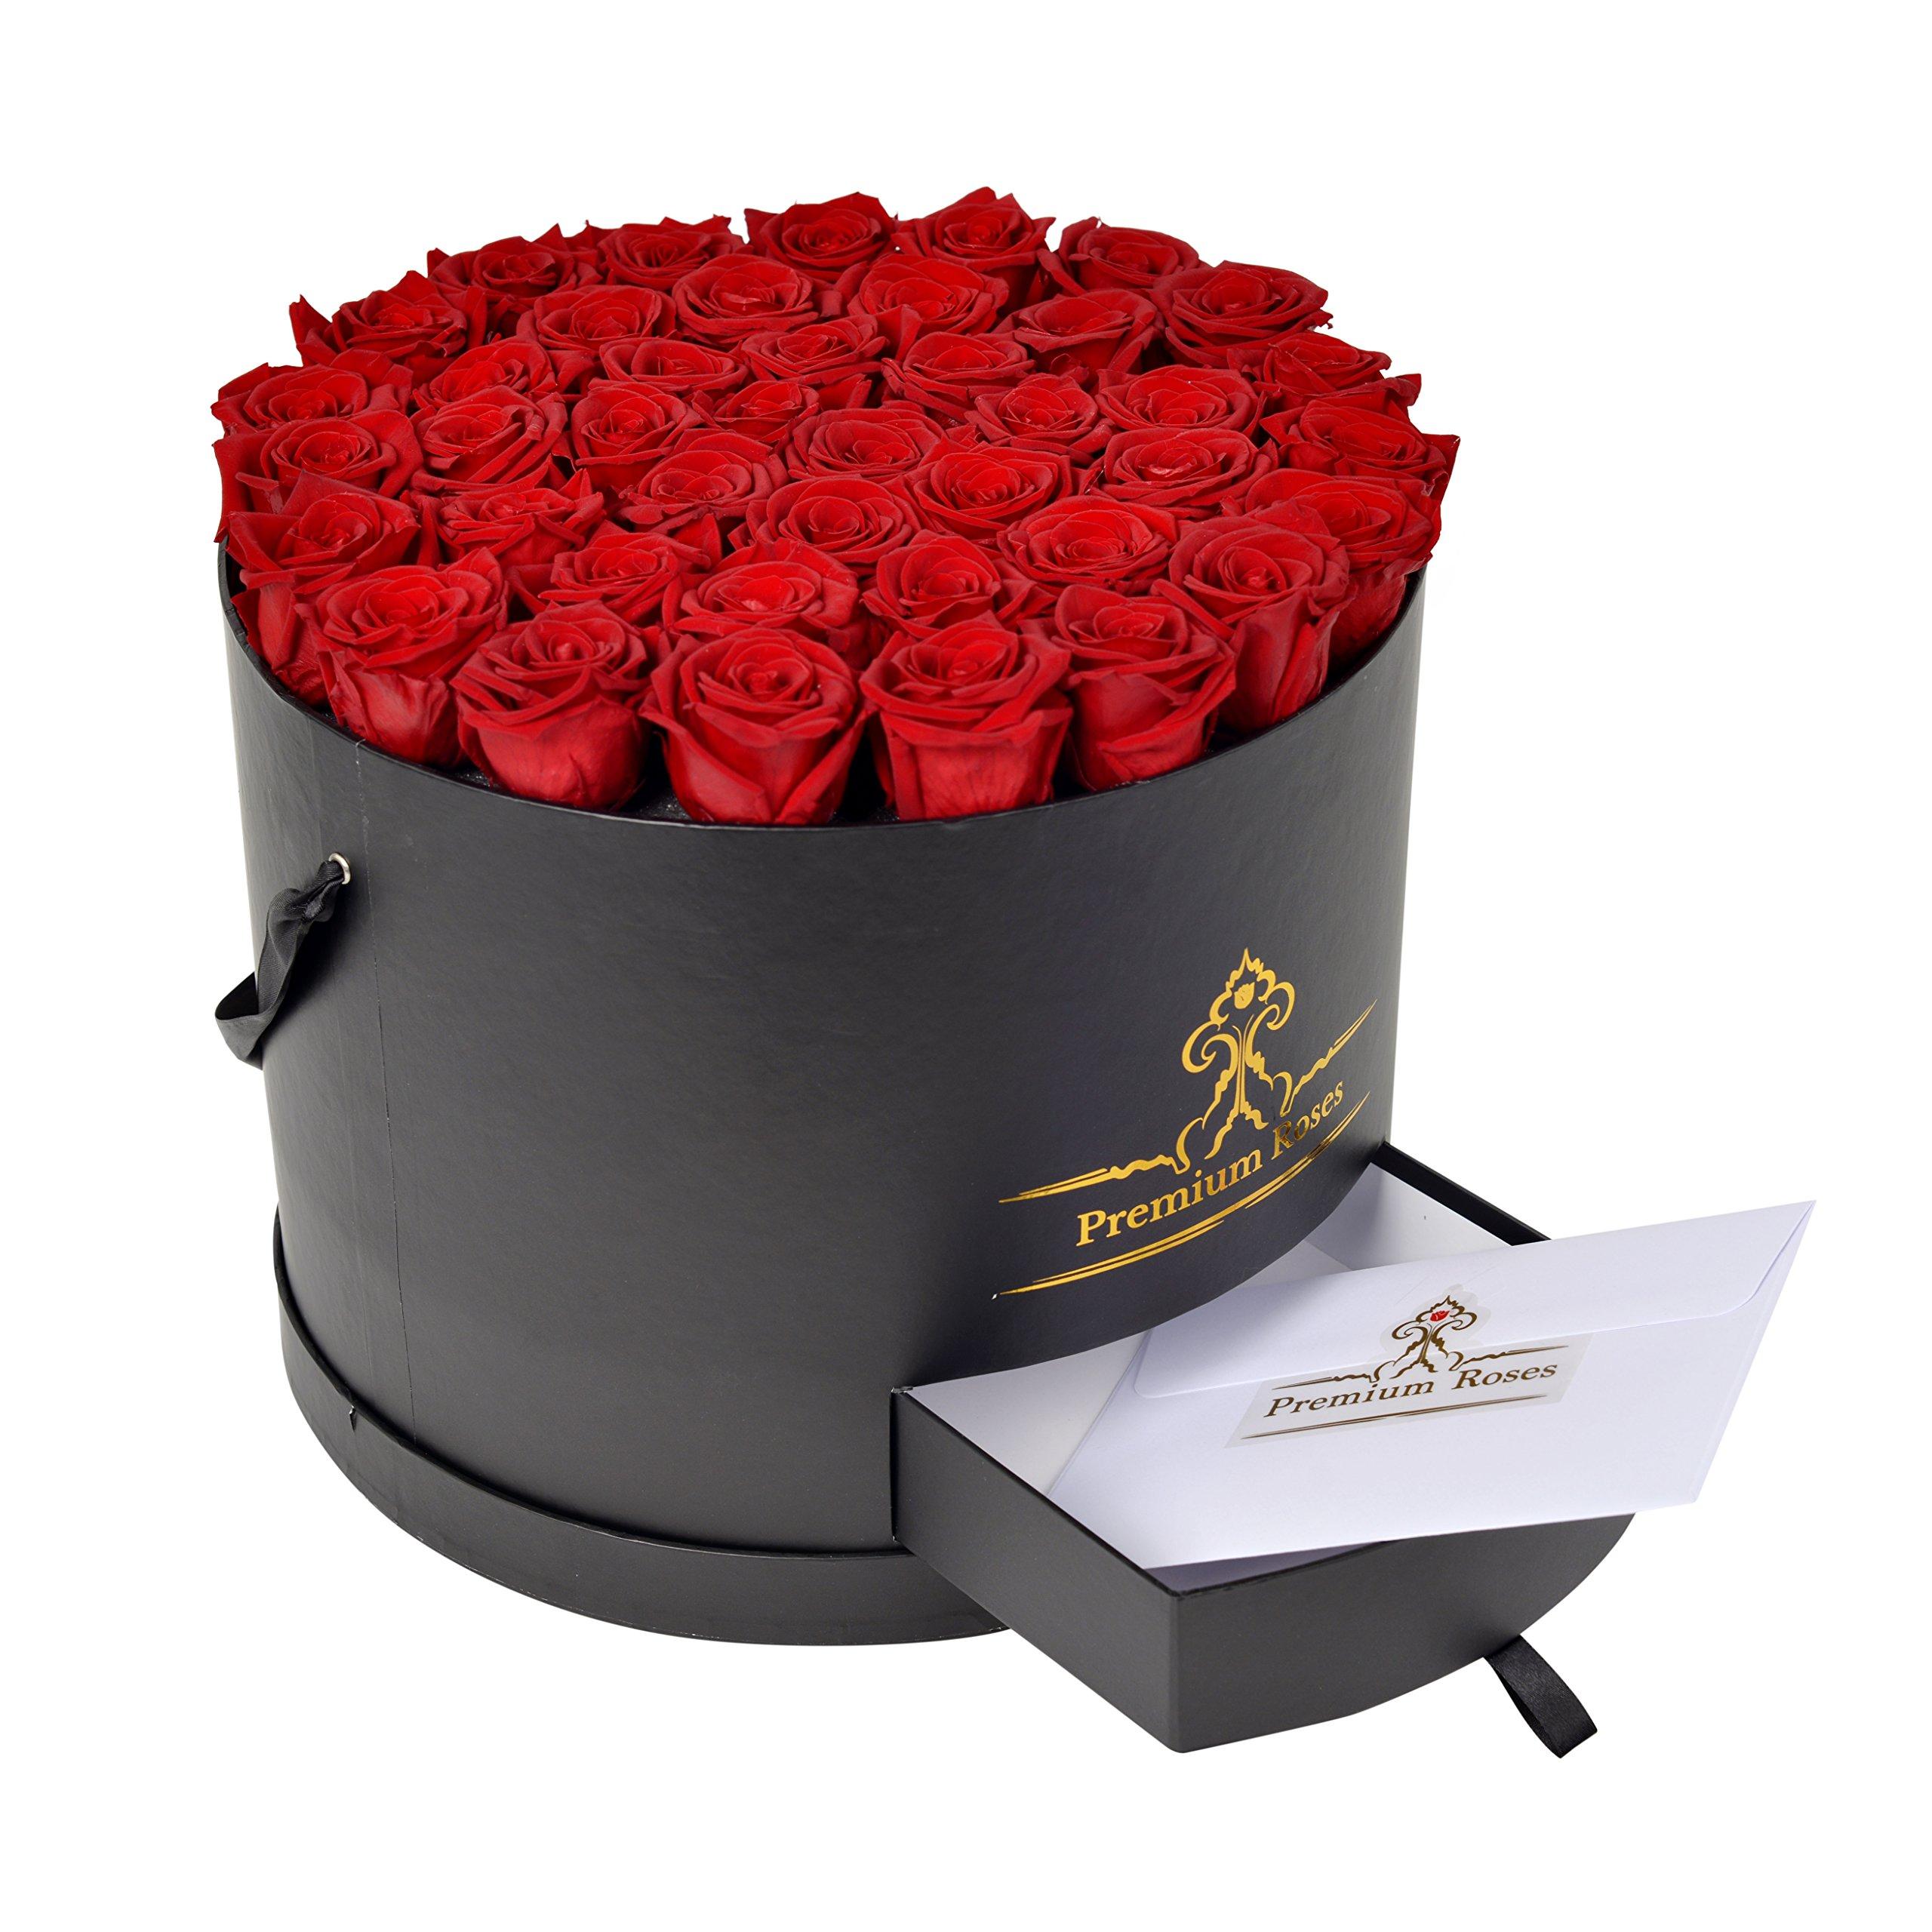 Premium Roses| Model Black| Real Roses That Last 365 Days| Fresh Flowers (Black Box, Large)